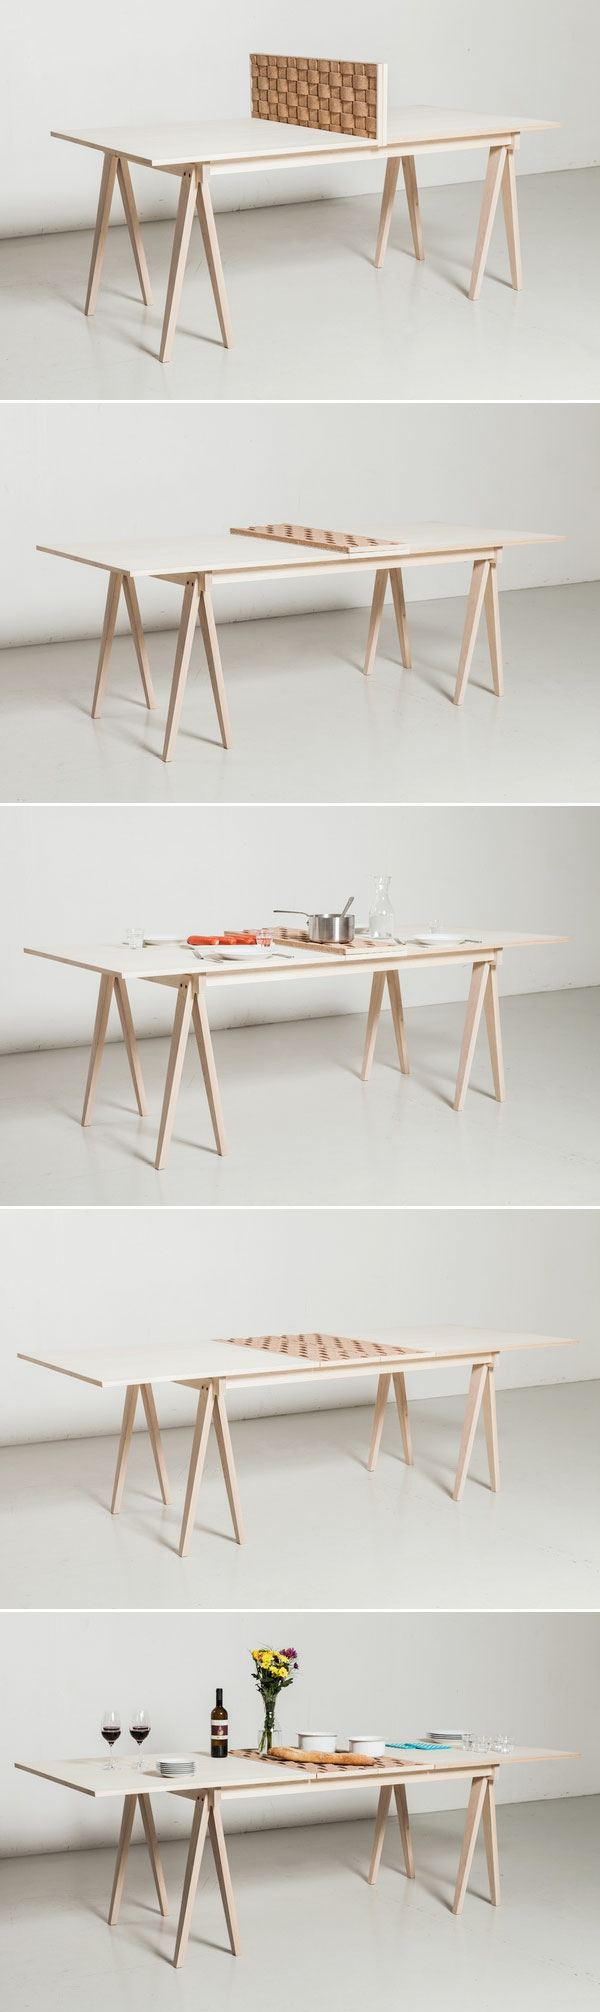 table rallonge bois Gudrun Theodora